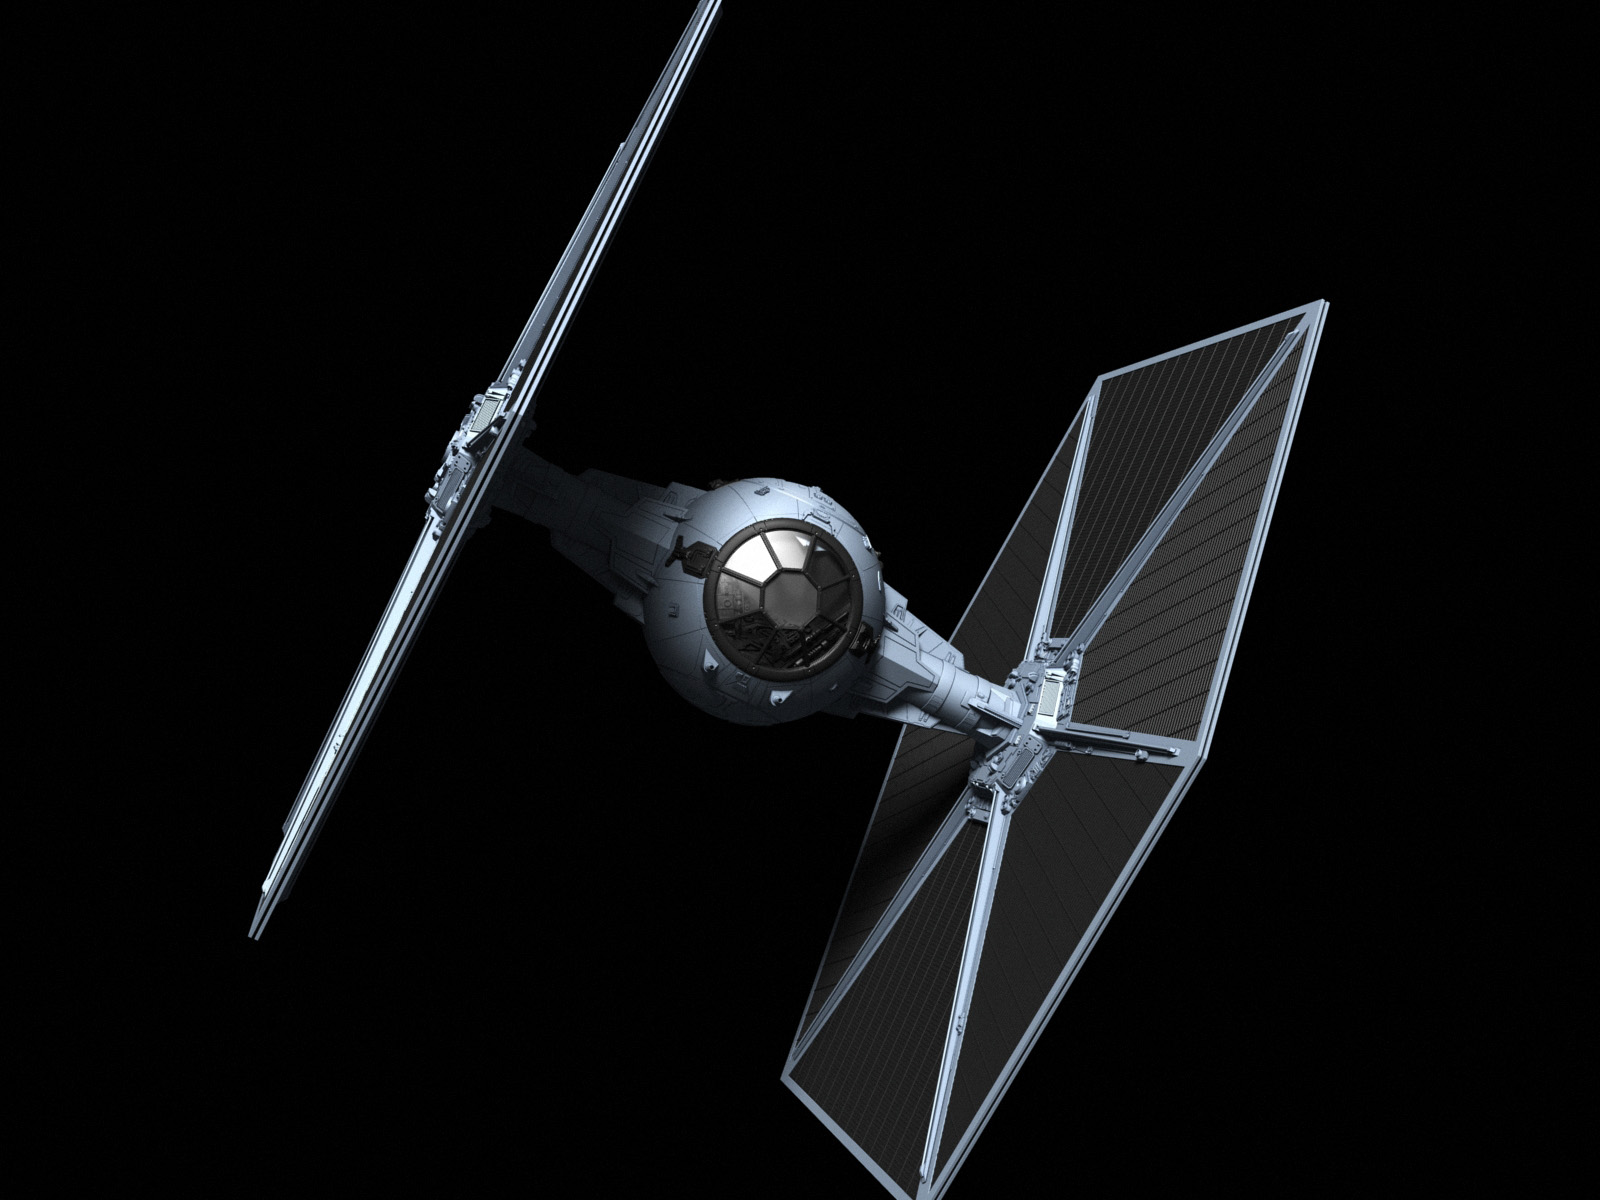 star wars spaceship black wallpaper 1600x1200 67812 wallpaperup. Black Bedroom Furniture Sets. Home Design Ideas